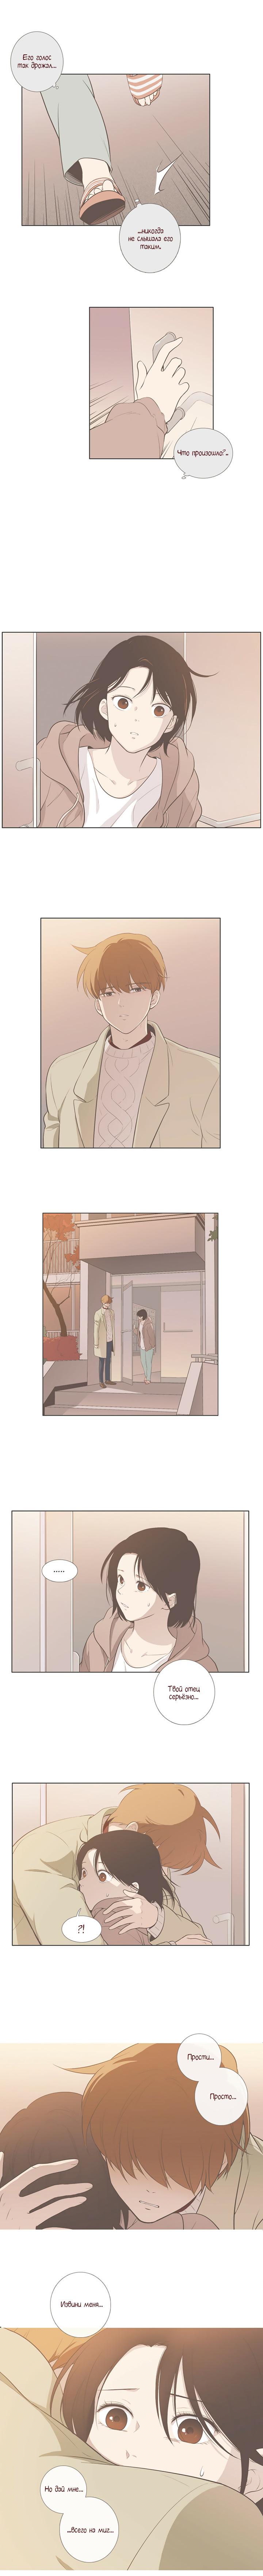 https://r1.ninemanga.com/comics/pic2/12/22860/419708/1534422451102.jpg Page 8